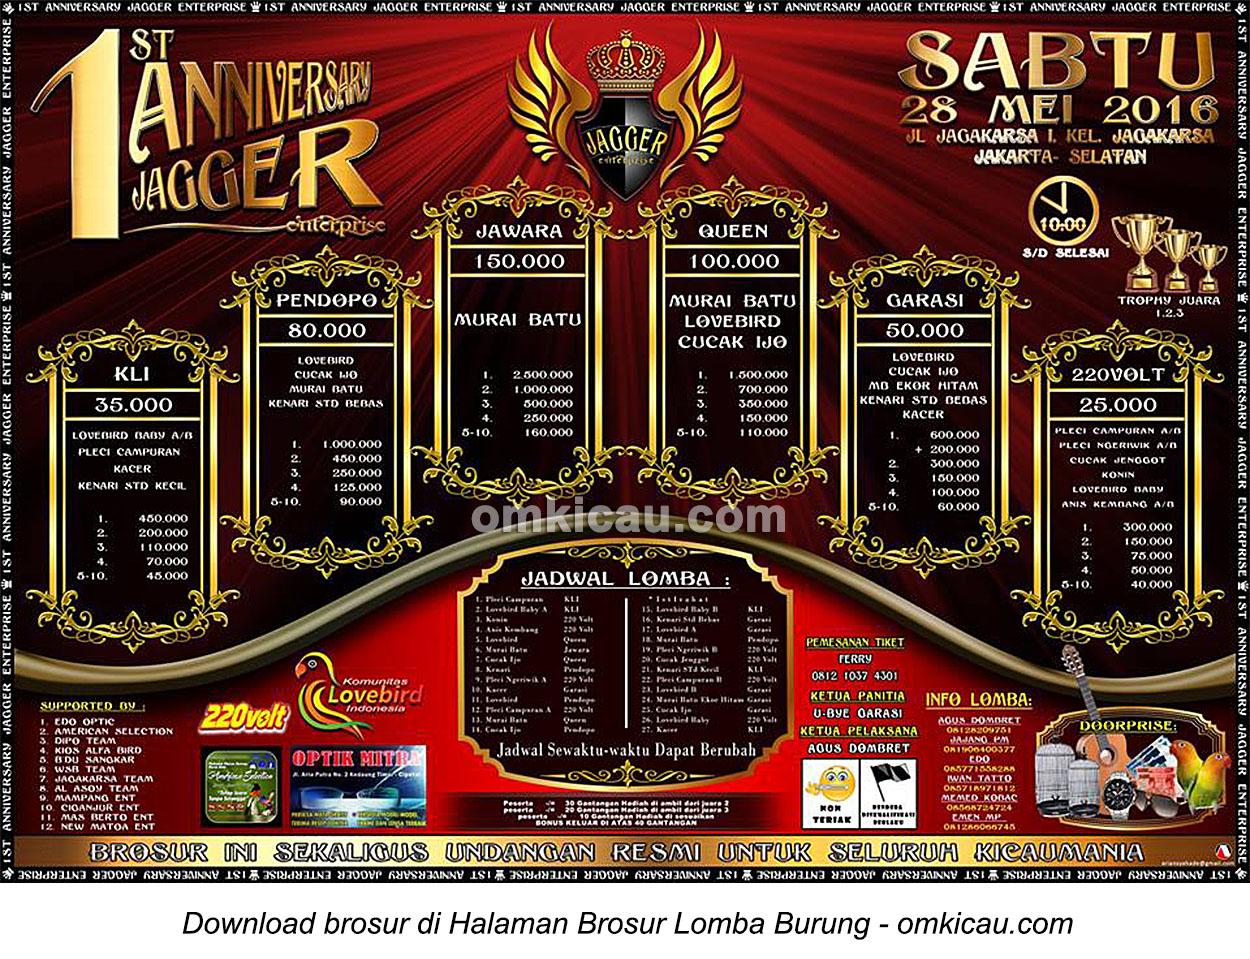 Brosur Lomba Burung Berkicau 1st Anniversary Jagger, Jakarta Selatan, 28 Mei 2016